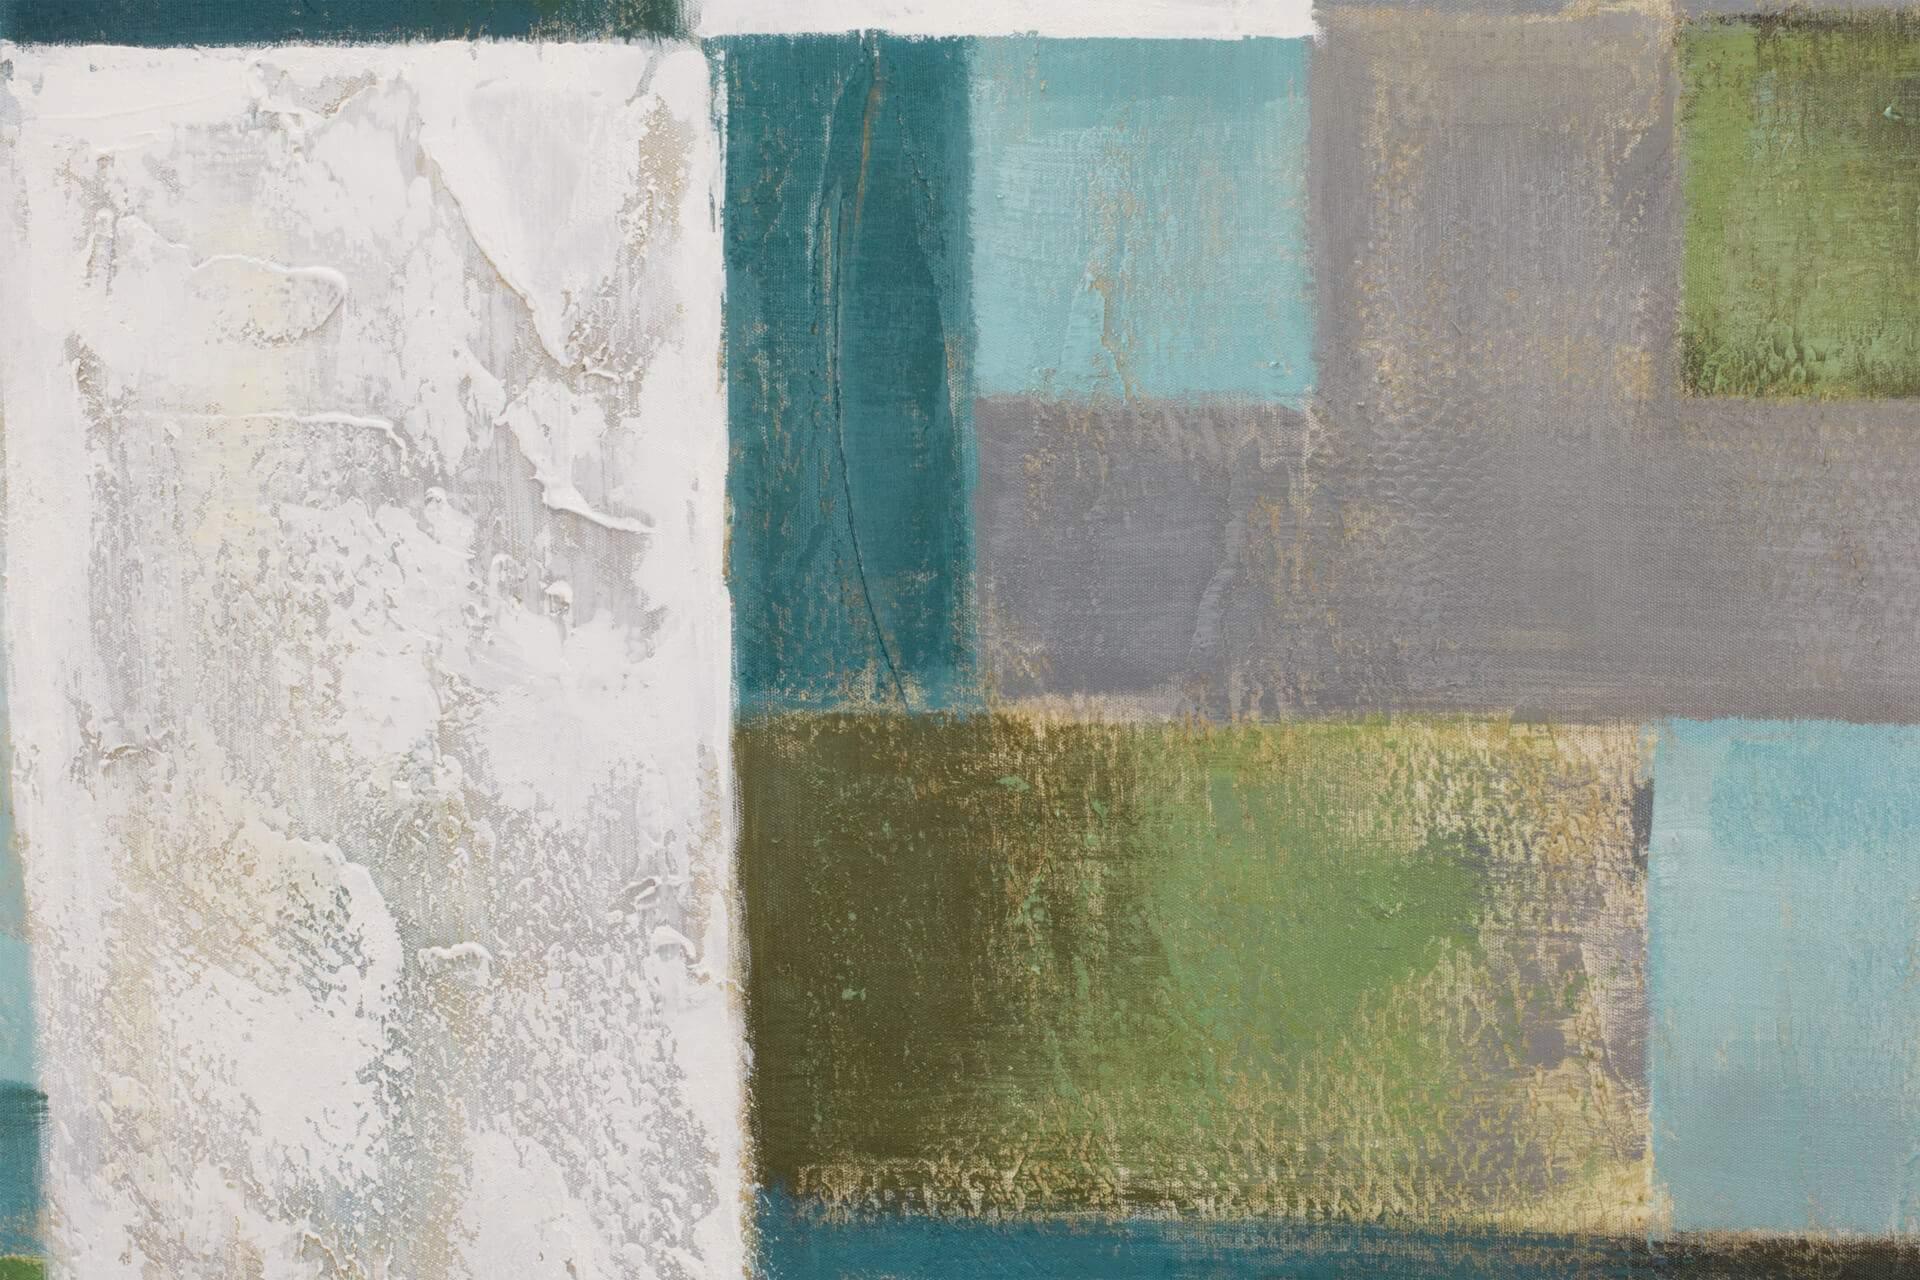 KL modern quadrate modern acryl gemaelde oel bild oelgemaelde 10